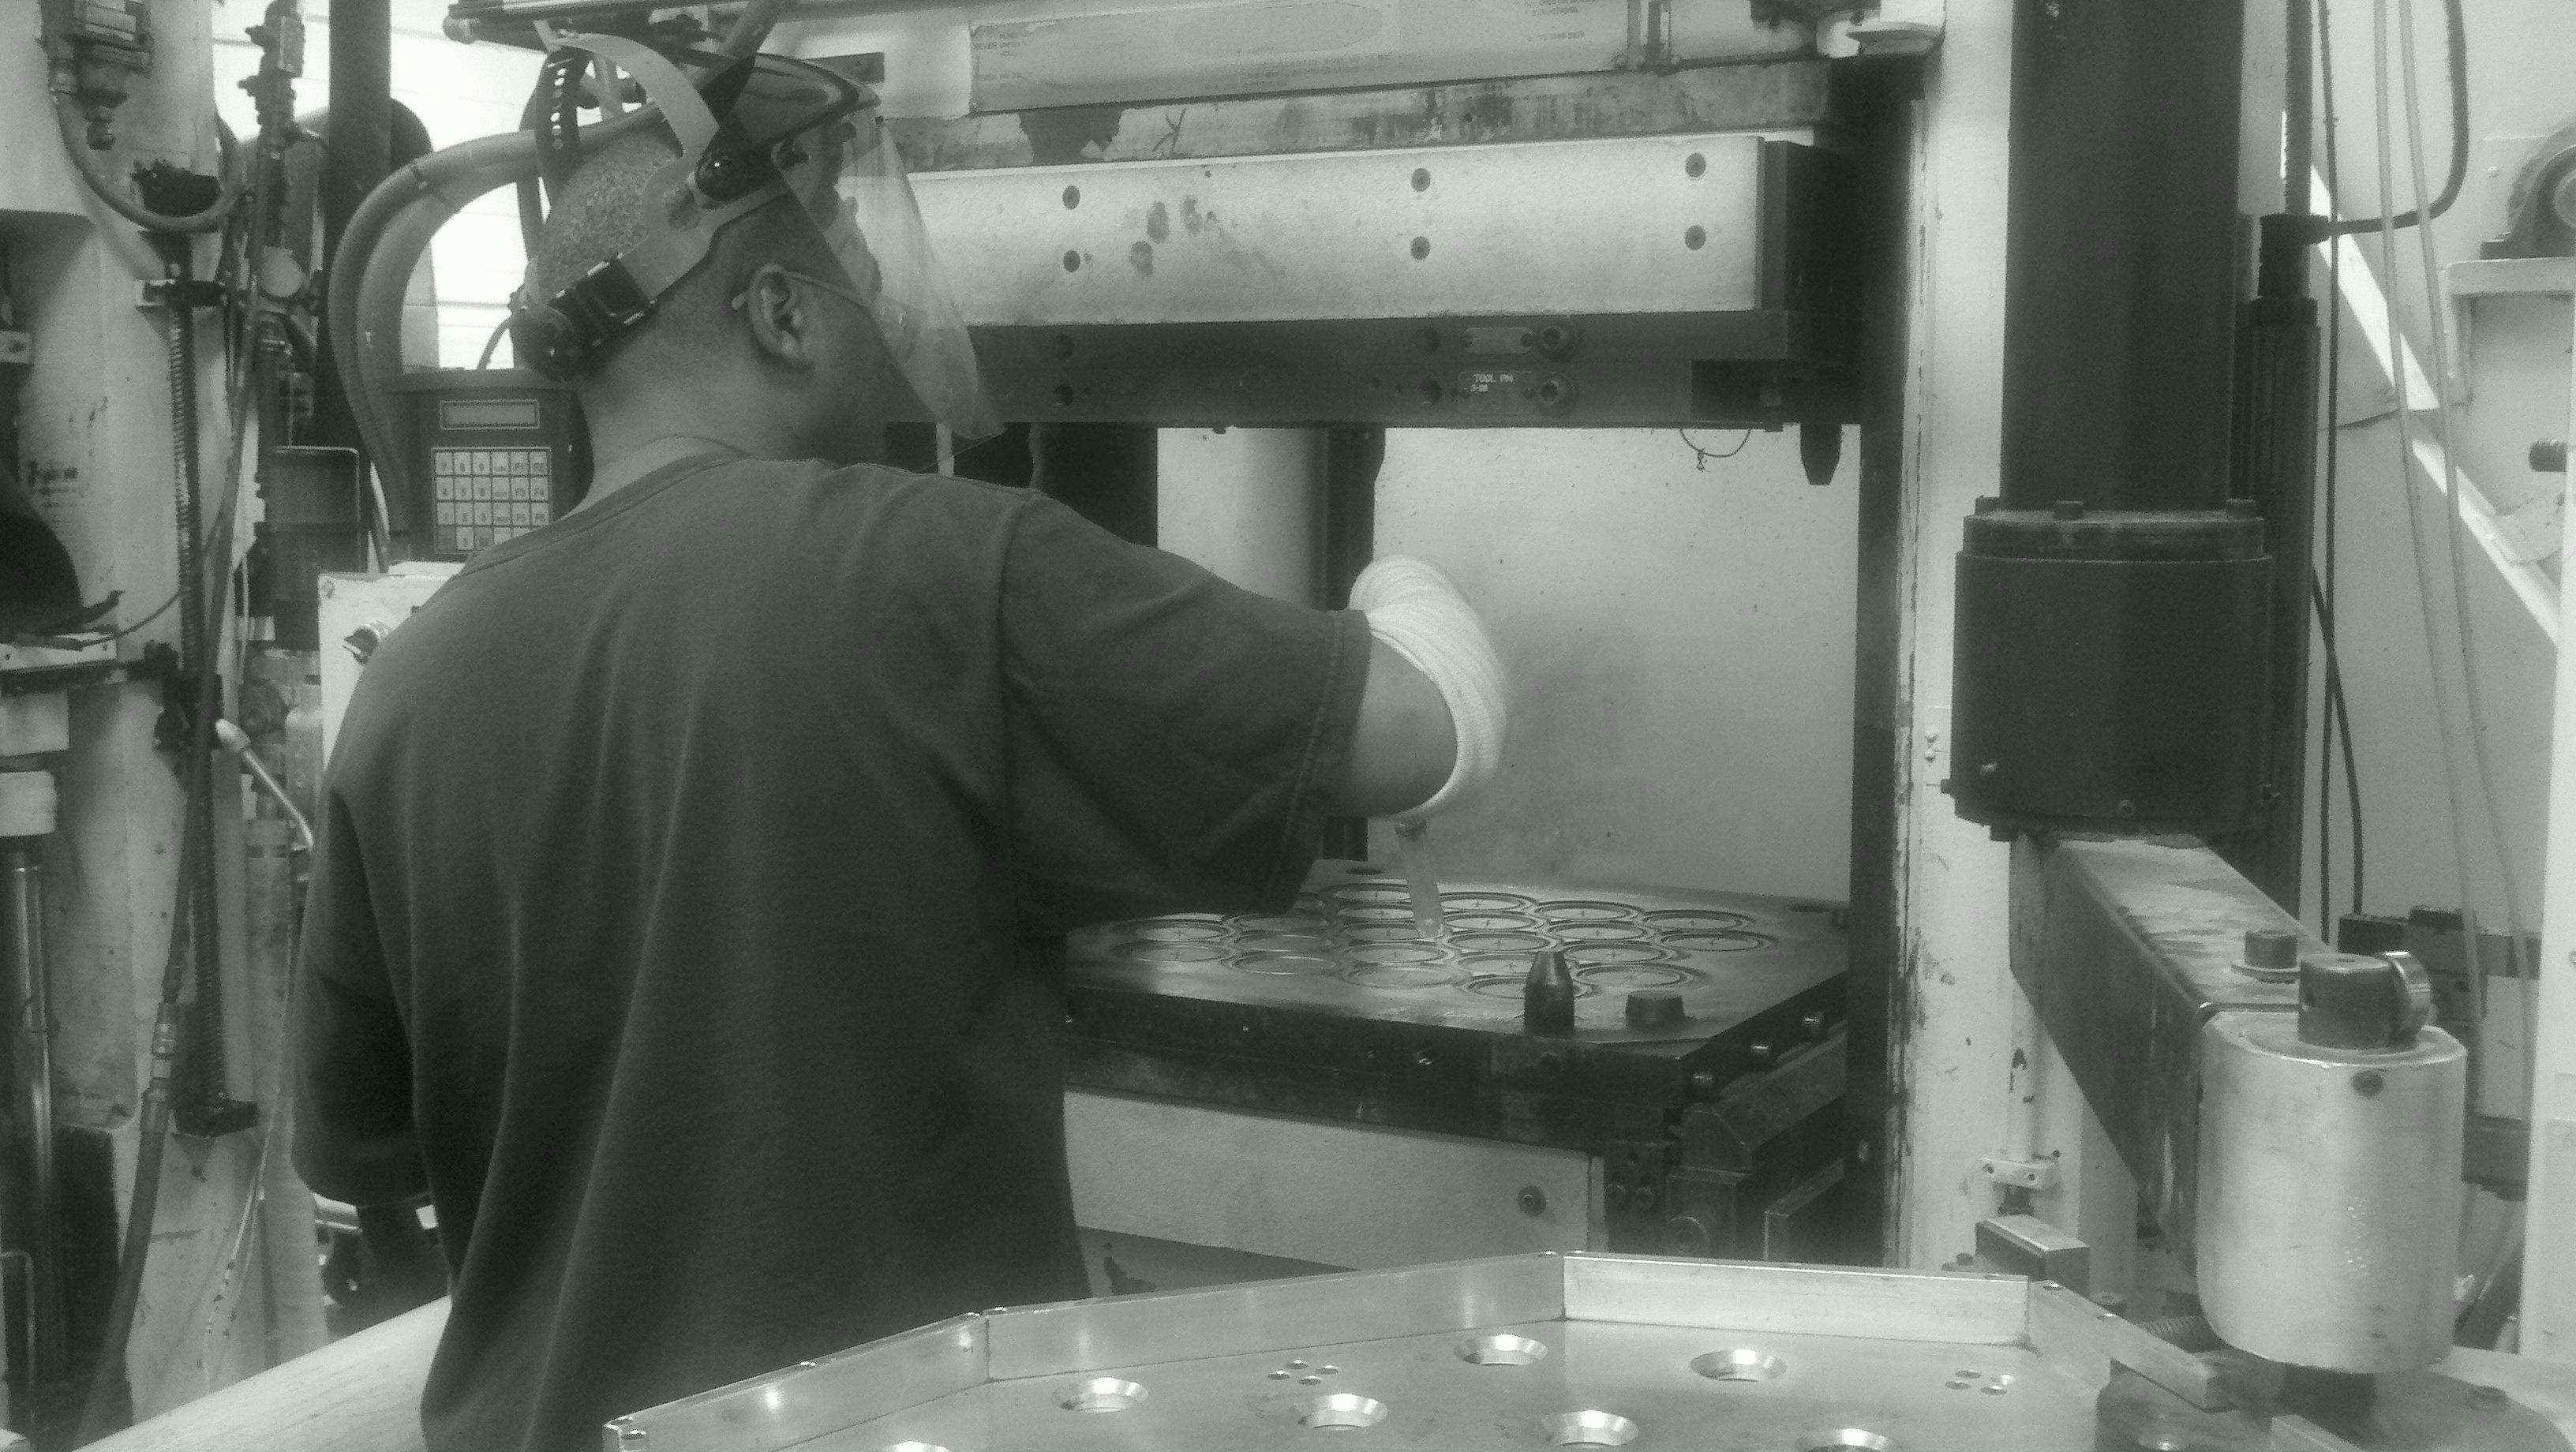 Dry ice blasting rubber molds